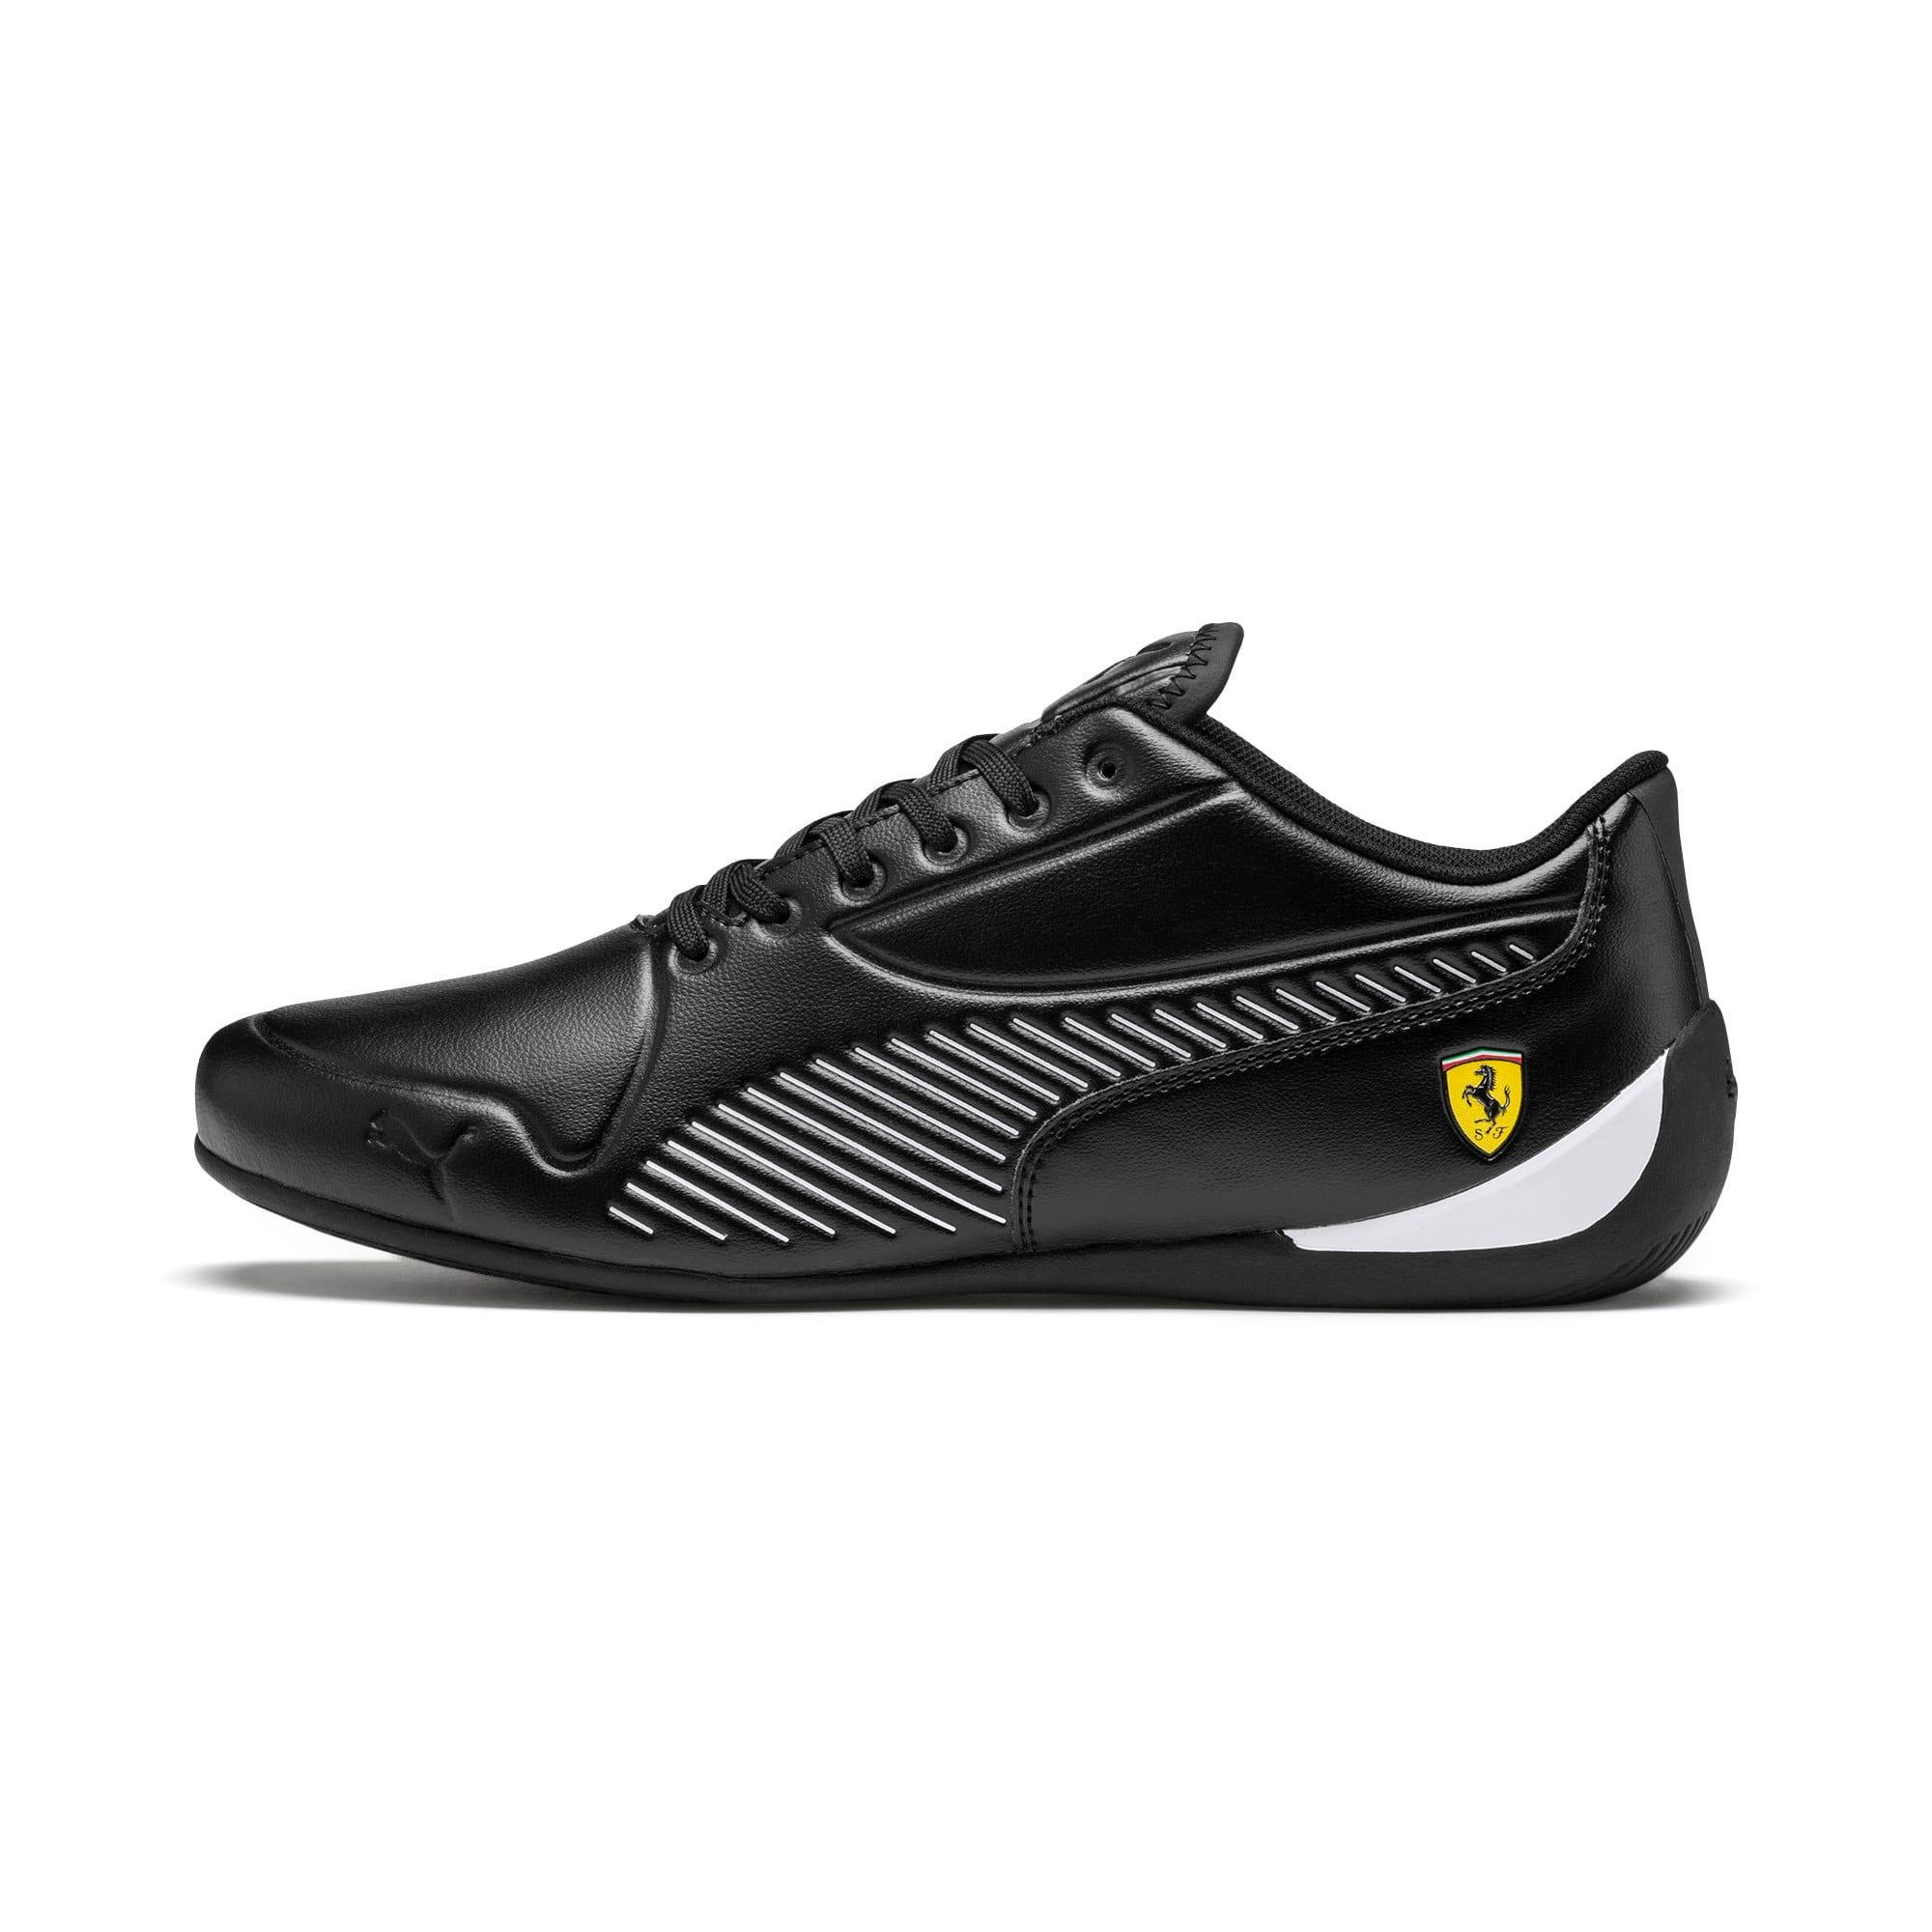 Thumbnail 1 of Scuderia Ferrari Drift Cat 7S Ultra Men's Shoes, Puma Black-Puma White, medium